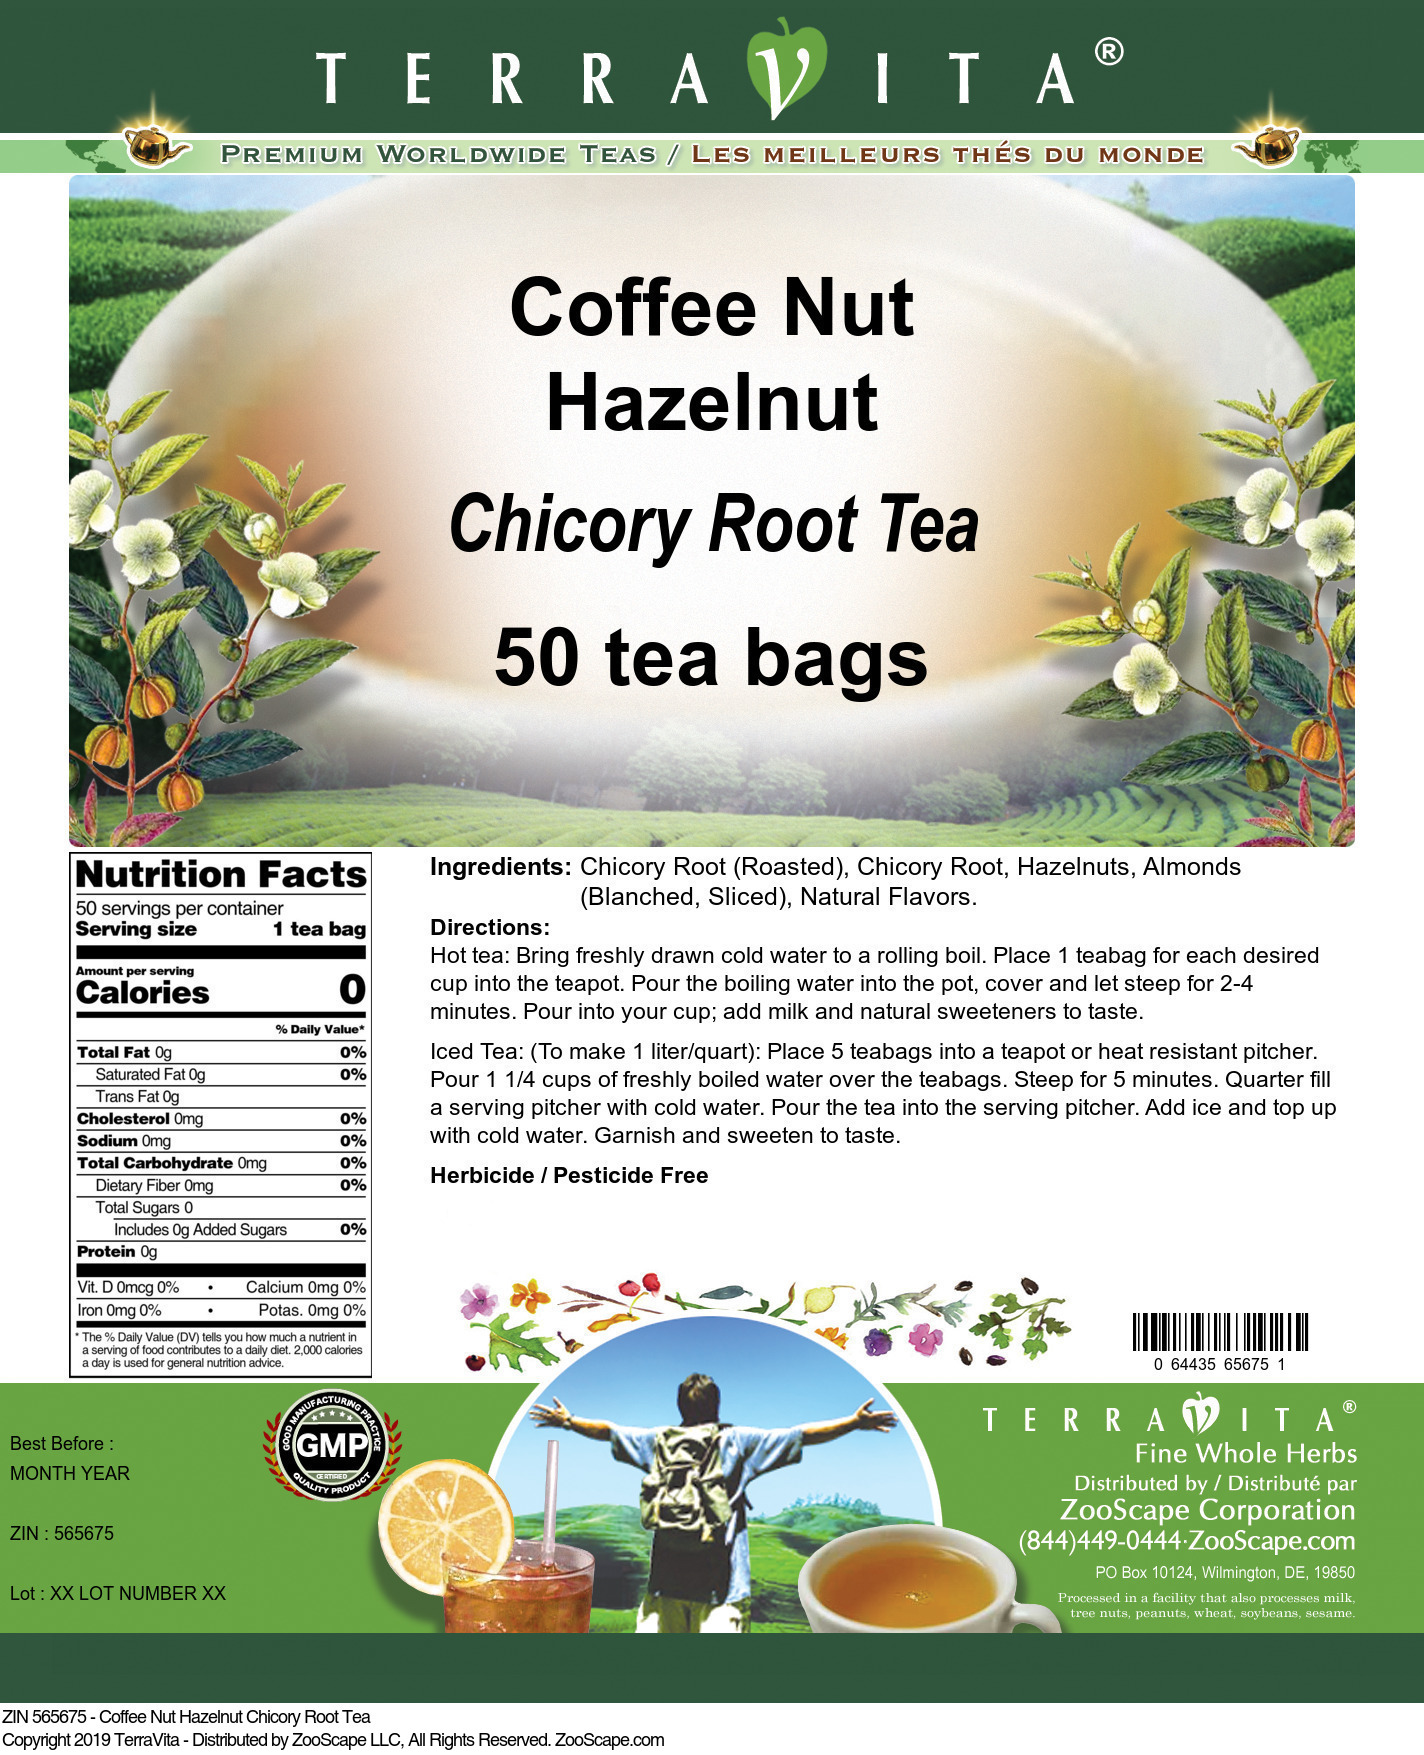 Coffee Nut Hazelnut Chicory Root